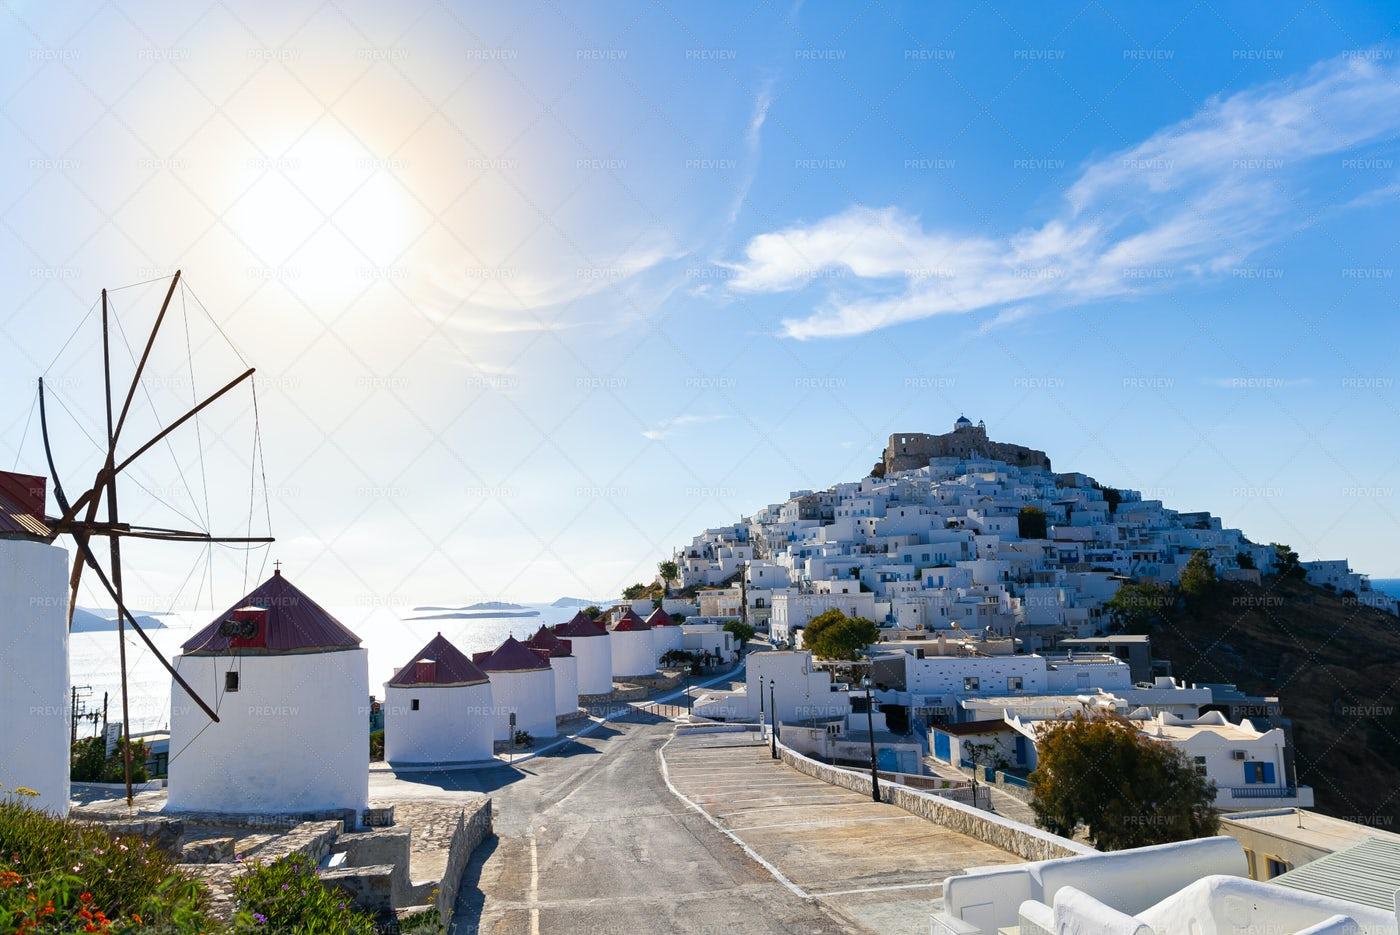 Greek Island Of Astypalaia: Stock Photos